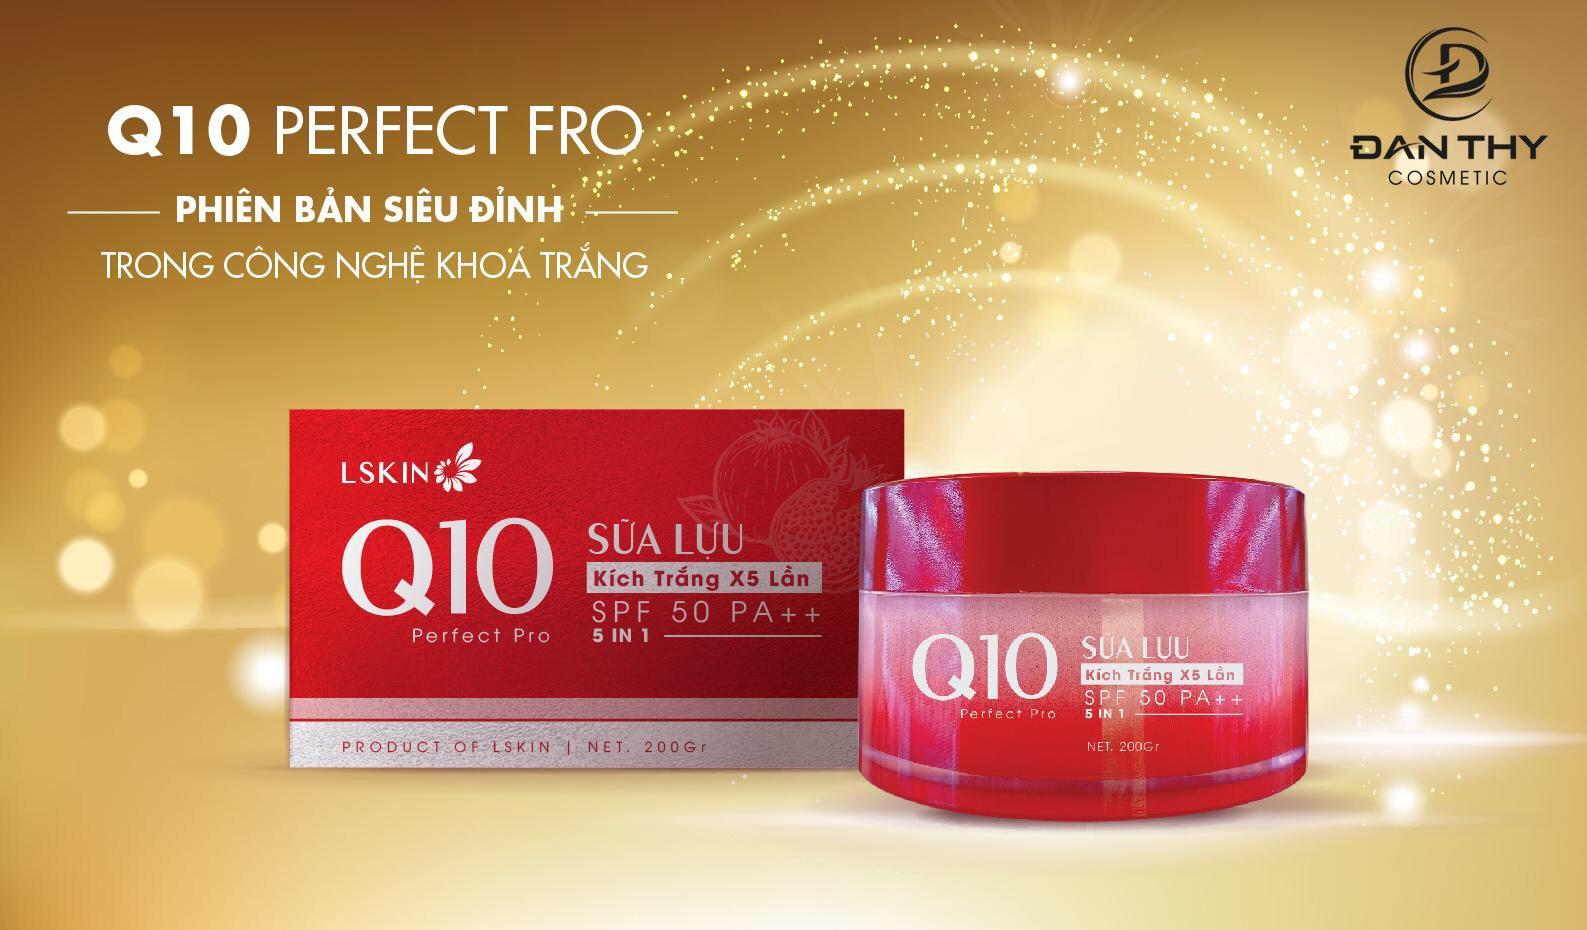 Body Q10 Perfect Pro